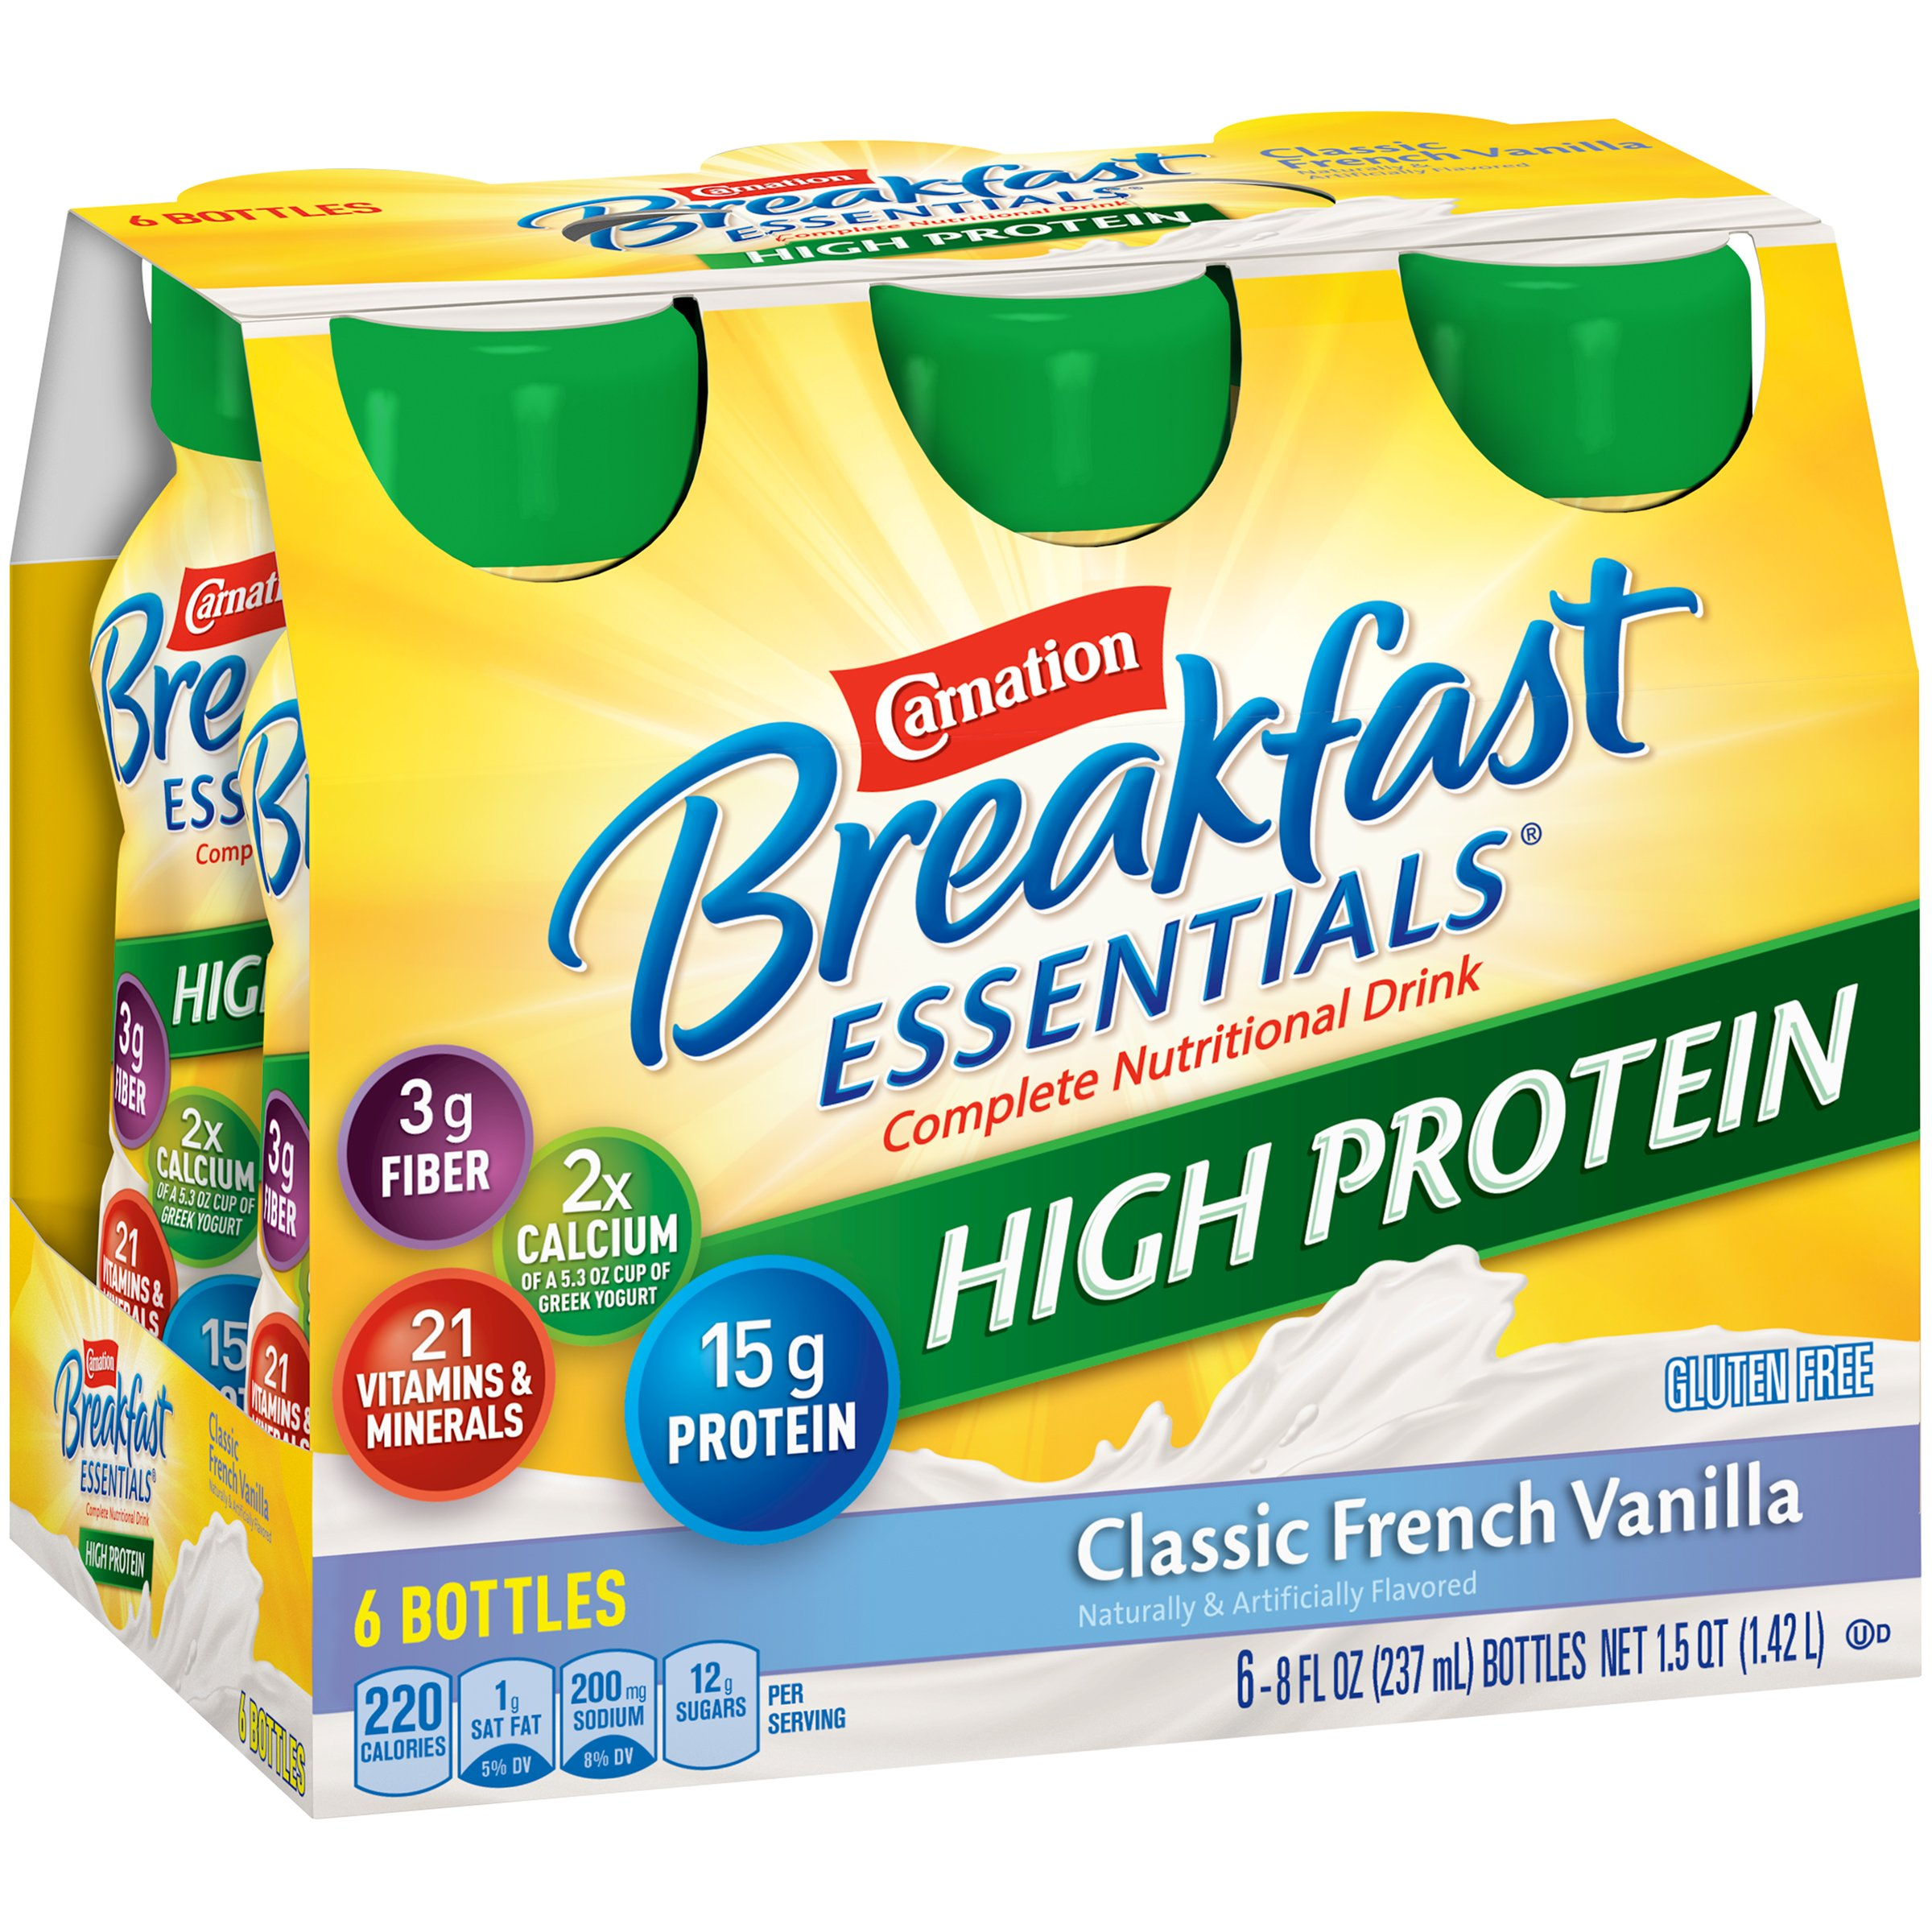 Carnation Breakfast Essentials High Protein Ready-to-Drink, Classic French Vanilla, 8 fl oz Bottle, 24 Pack by Carnation Breakfast Essentials